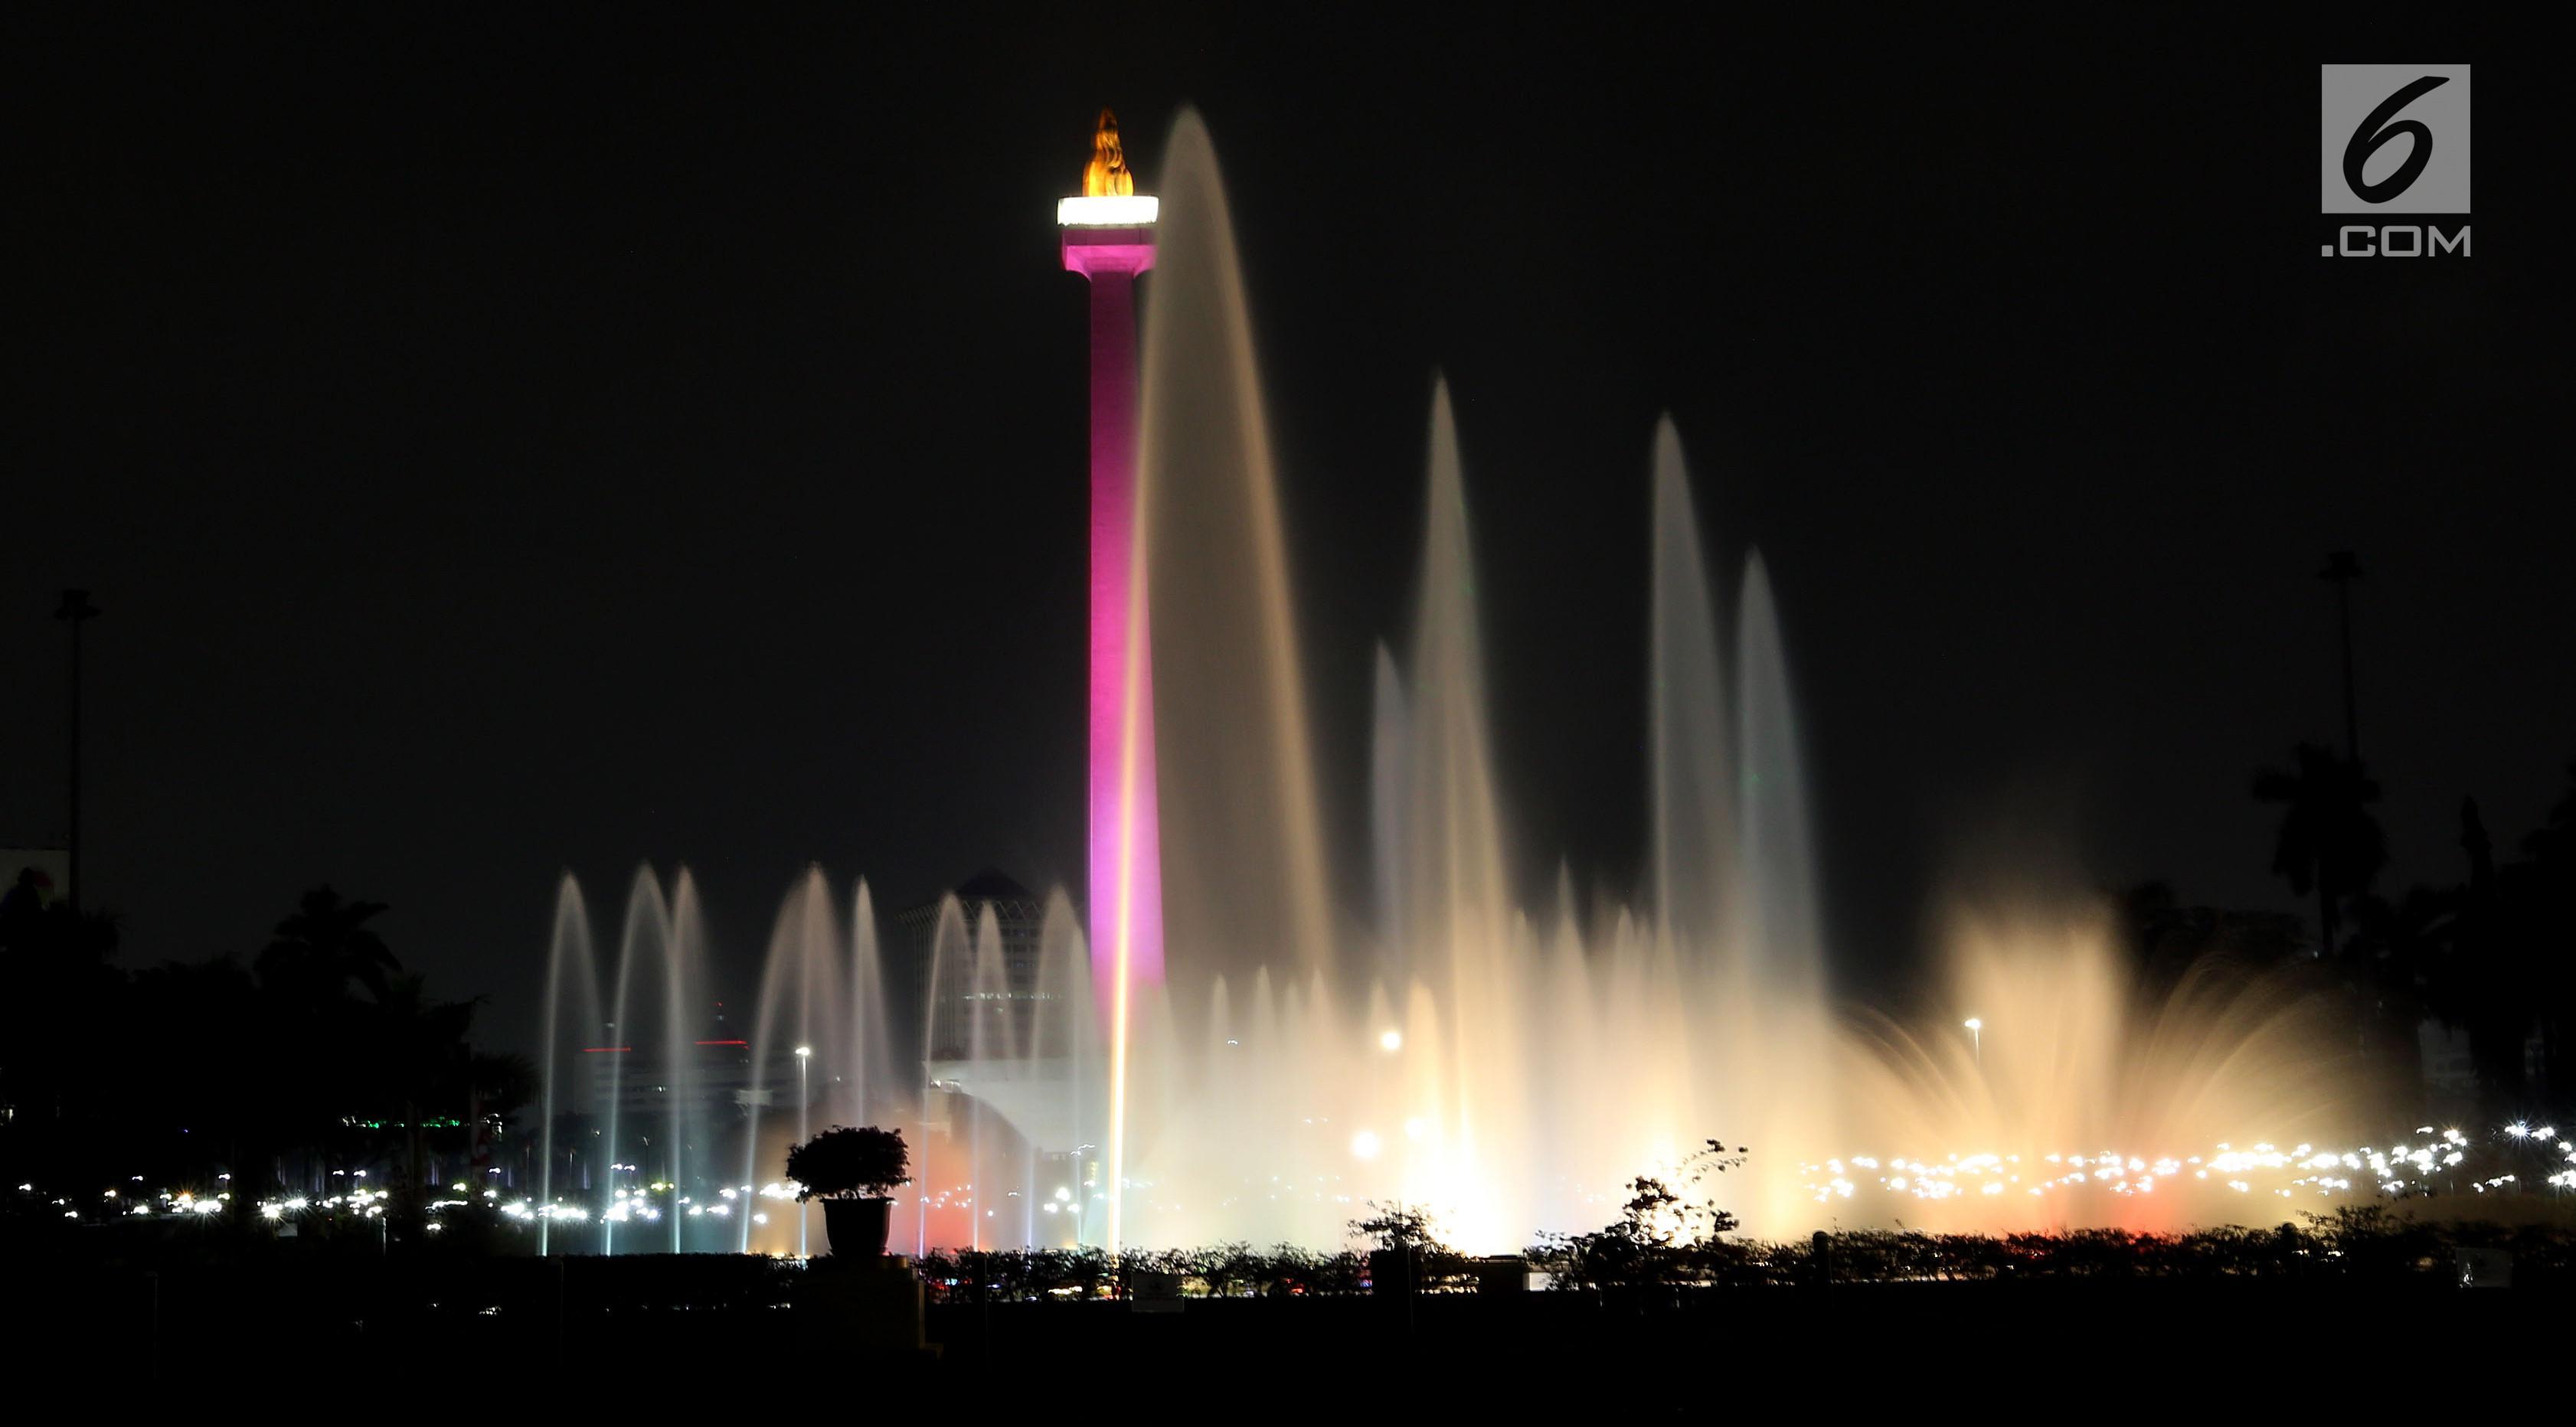 Air mancur yang dihiasi lampu saat di resmikan oleh Gubernur DKI Jakarta Djarot Saiful Hidayat di kawasan Monumen Nasional (Monas), Jakarta, Sabtu malam (12/8). (Liputan6.com/Johan Tallo)